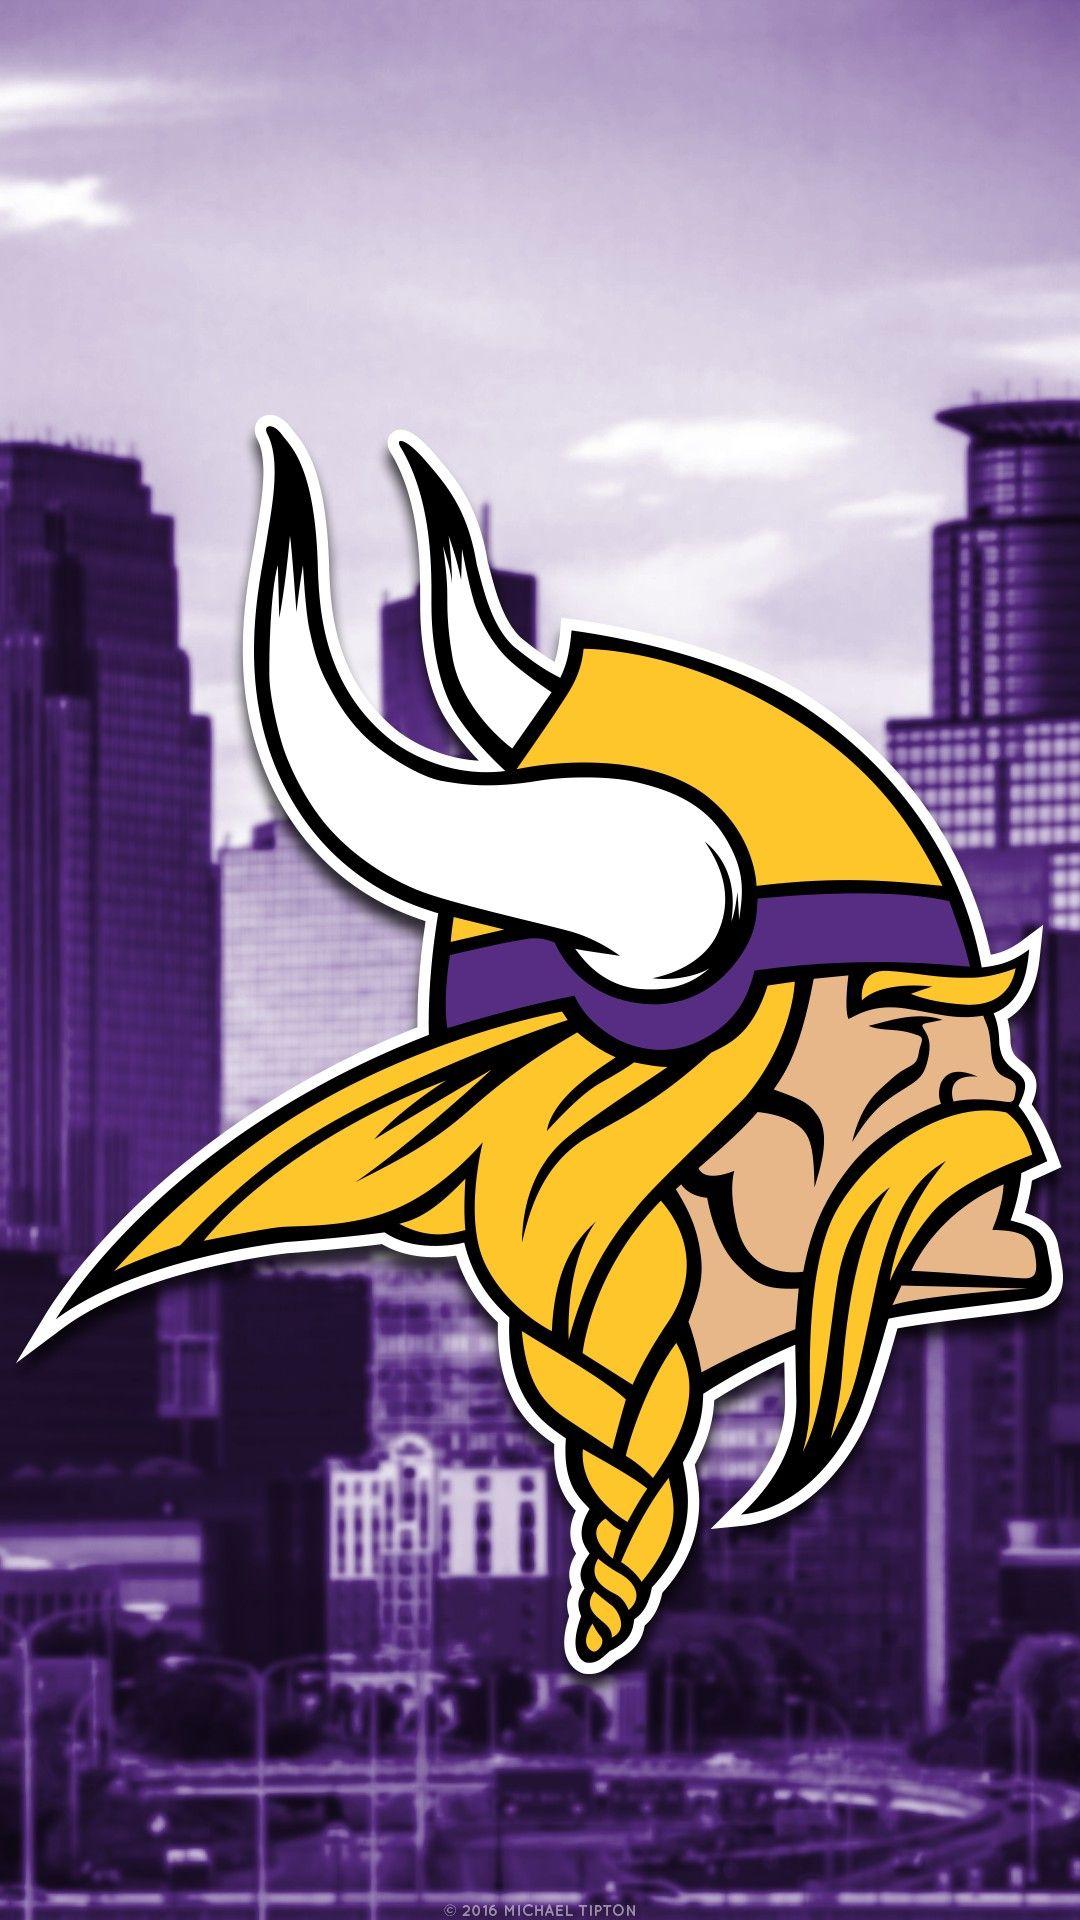 New Minnesota Vikings iPhone Wallpaper in 2020 Minnesota